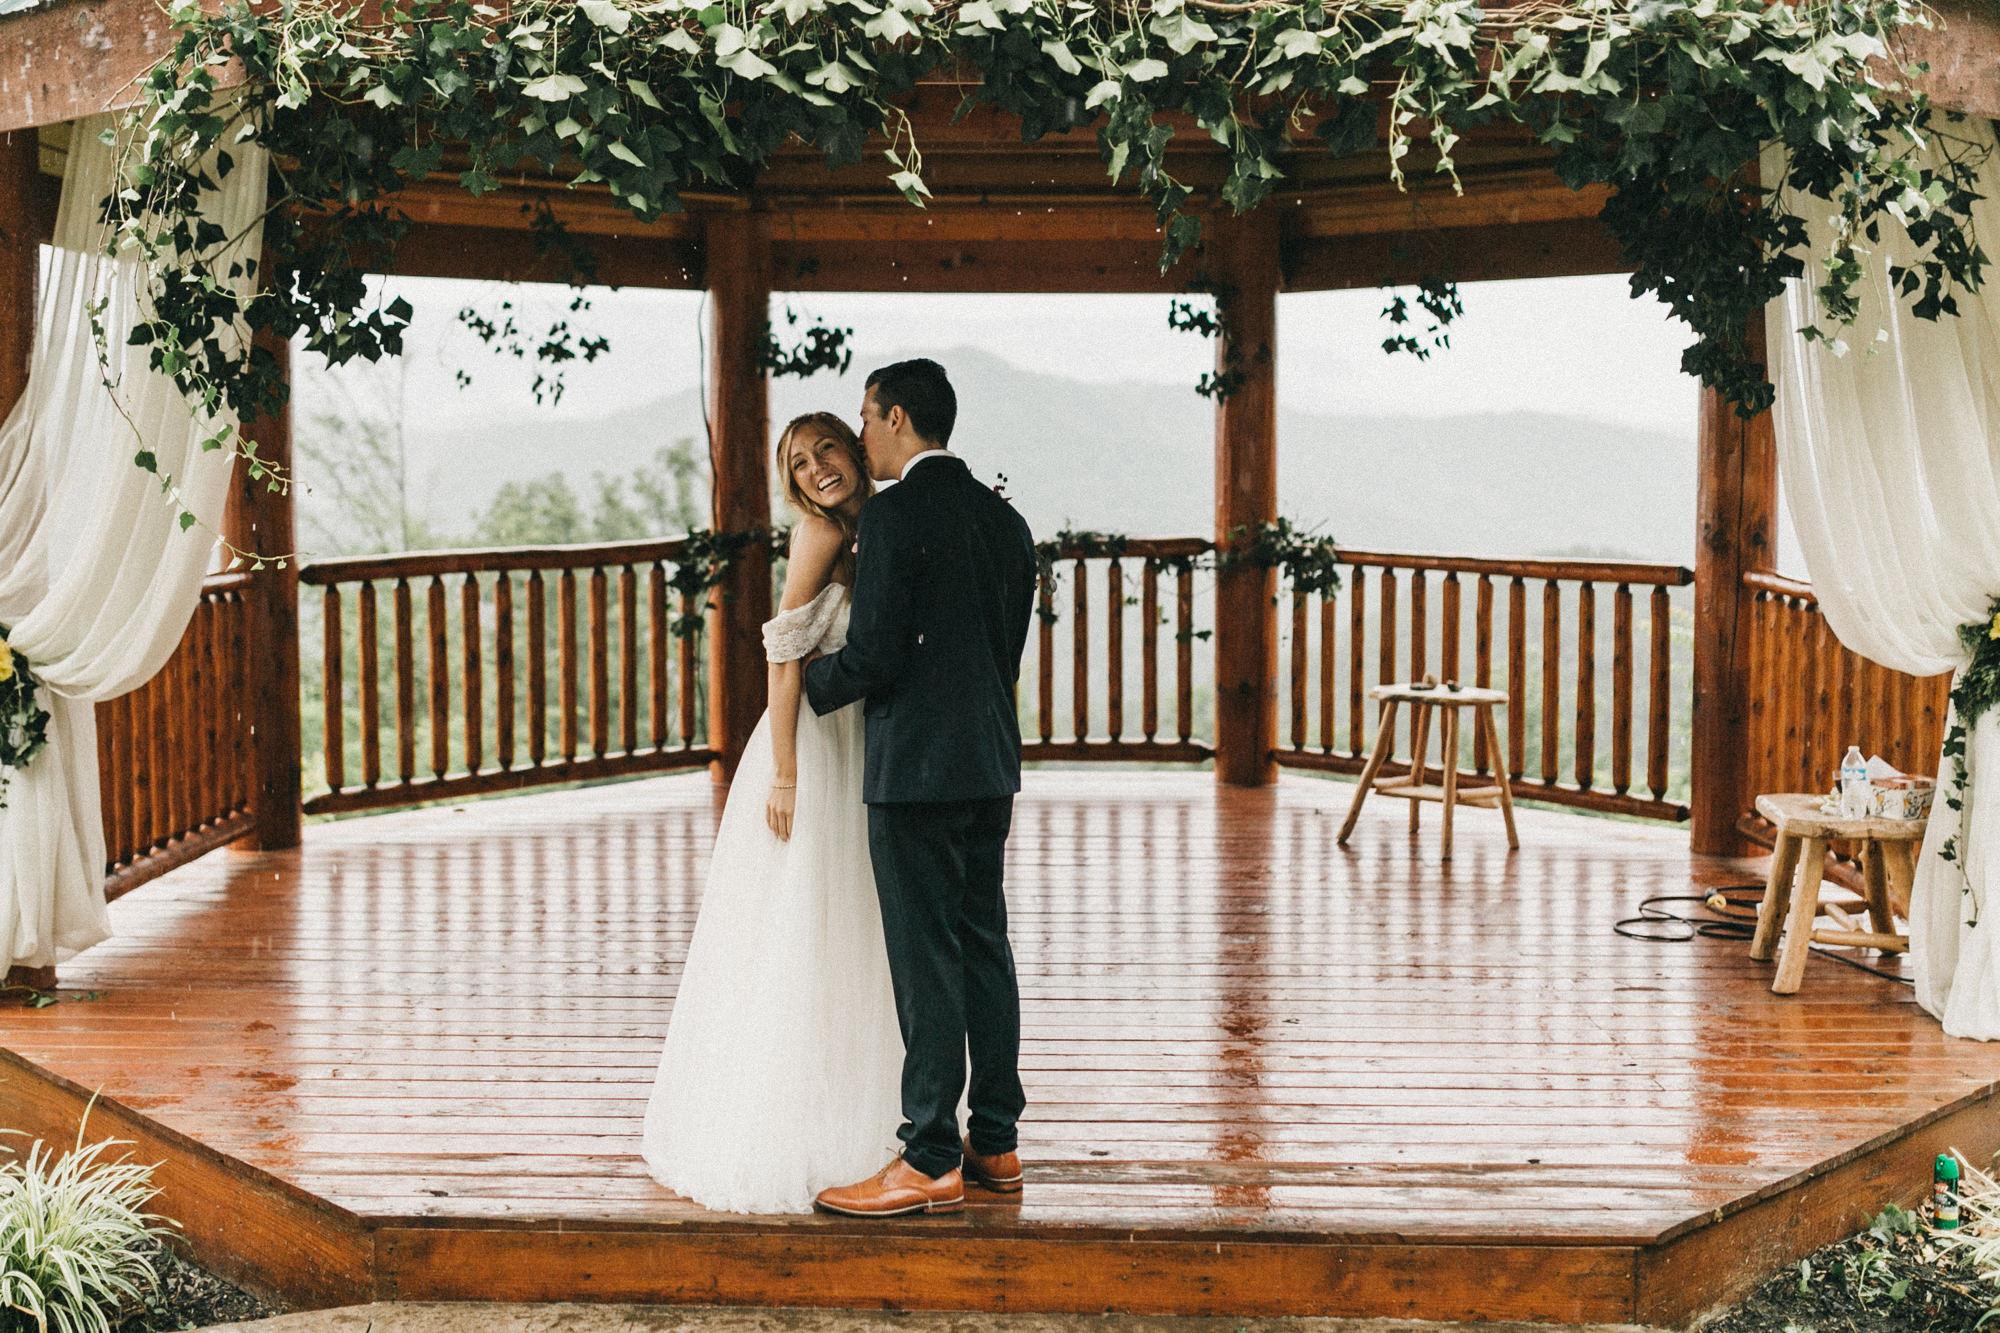 nashville_tennessee_wedding_photographer-92.jpg